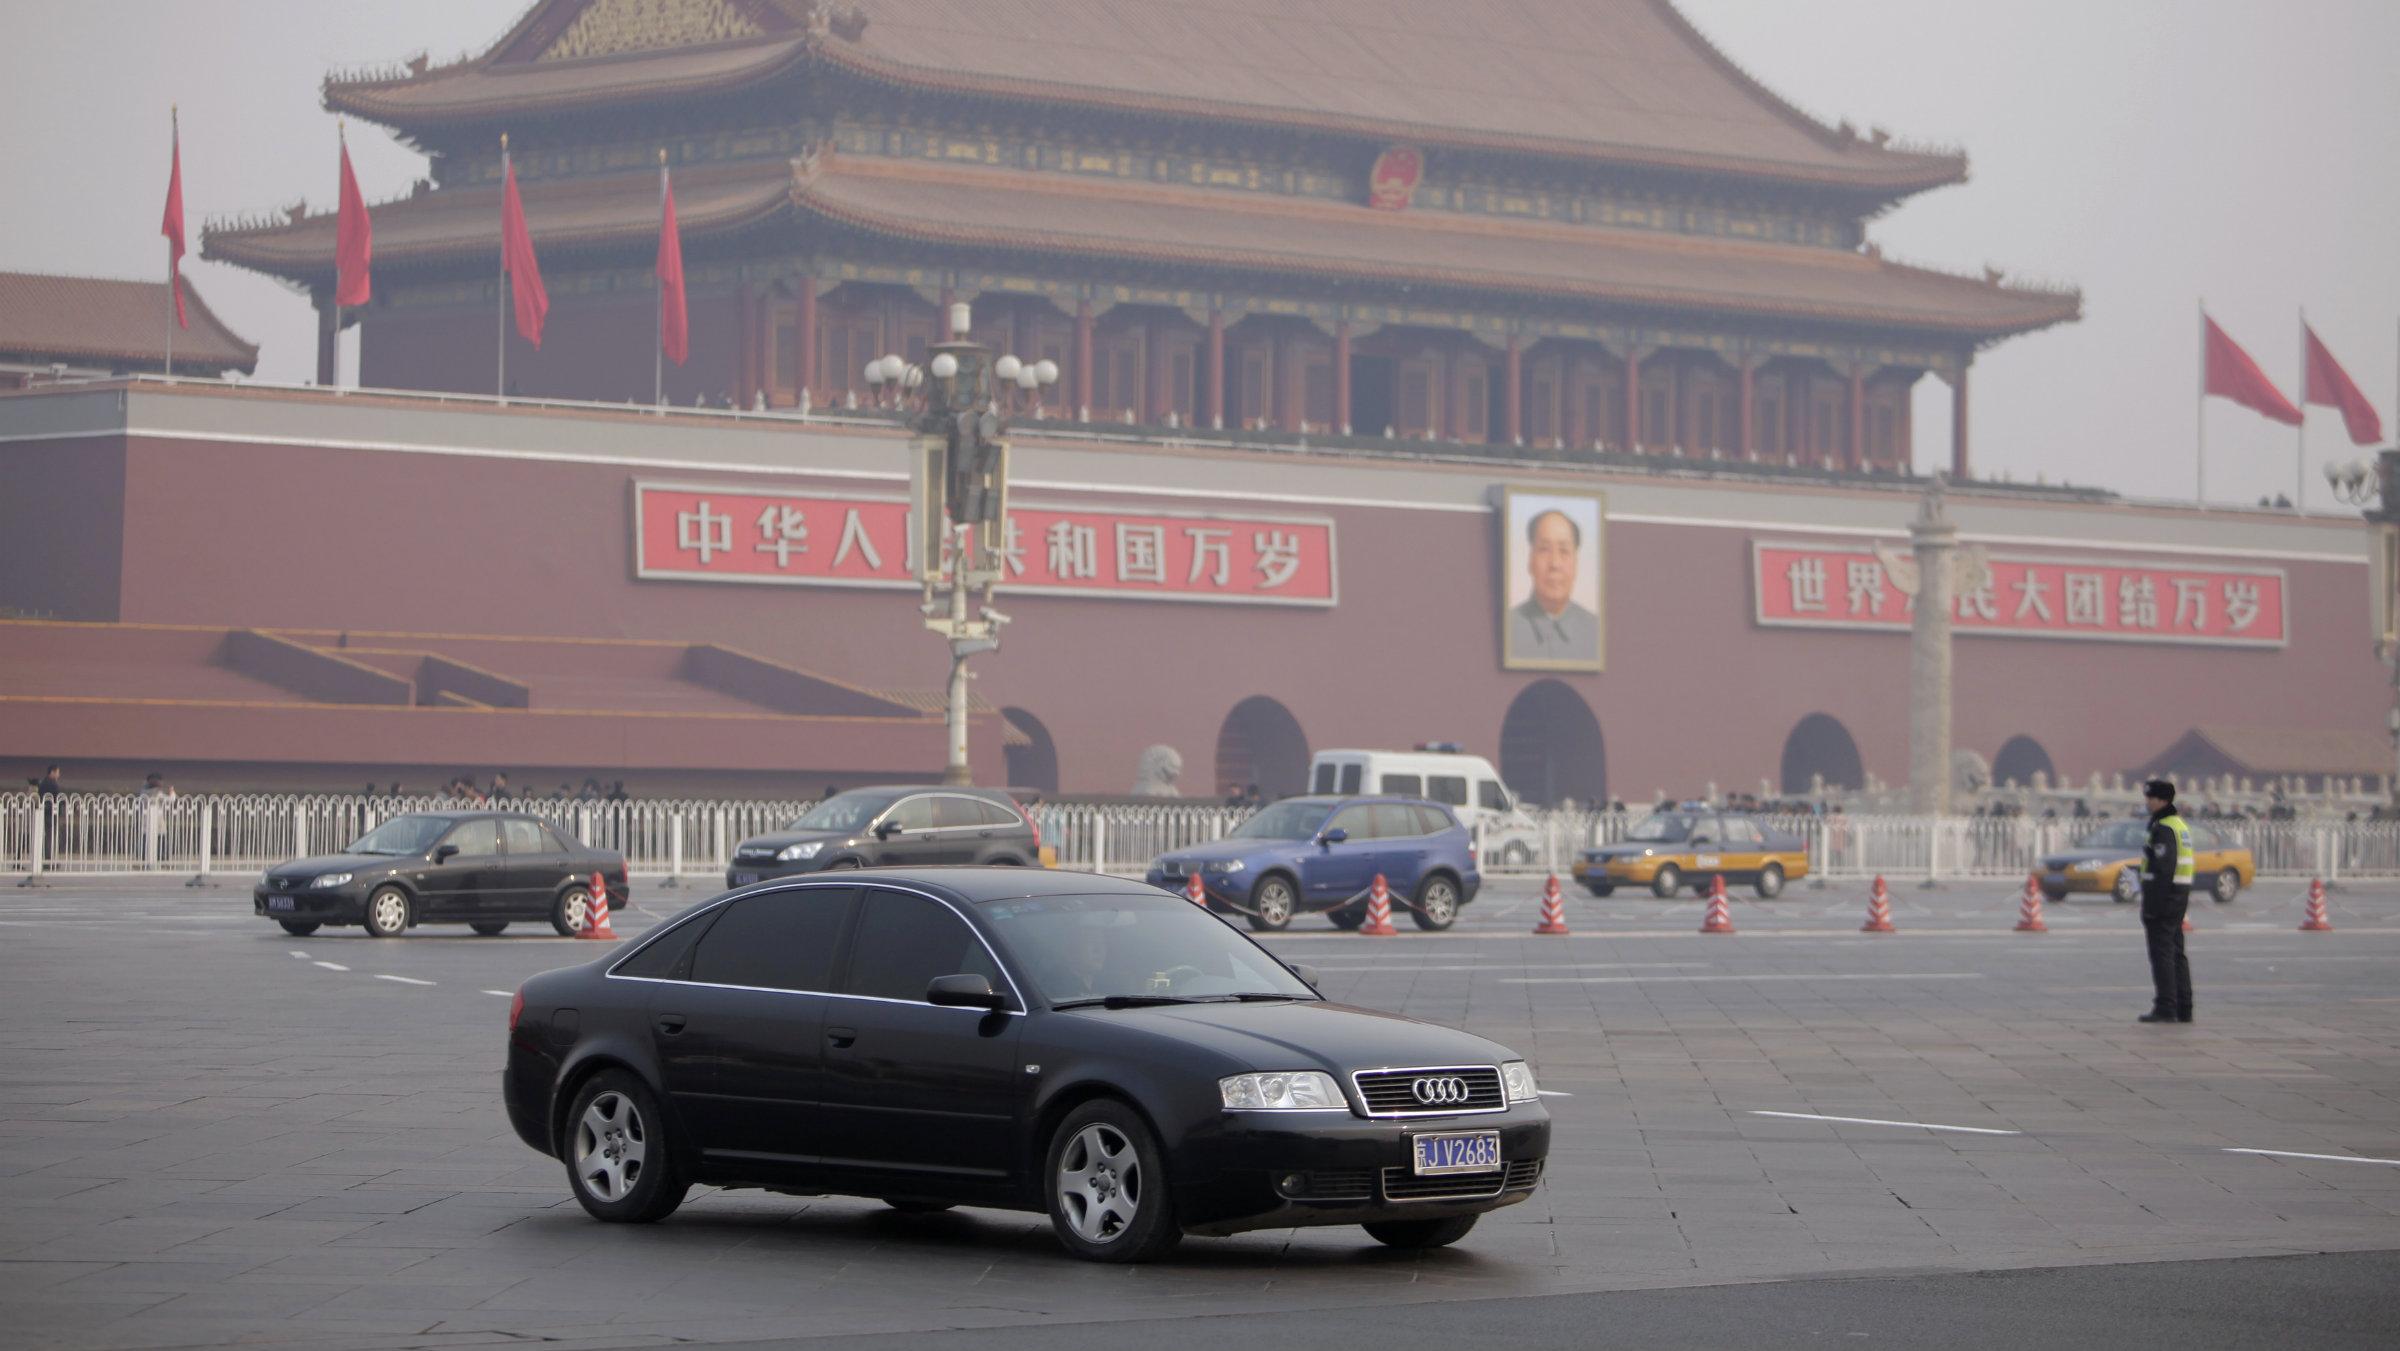 Cheaper outside China?